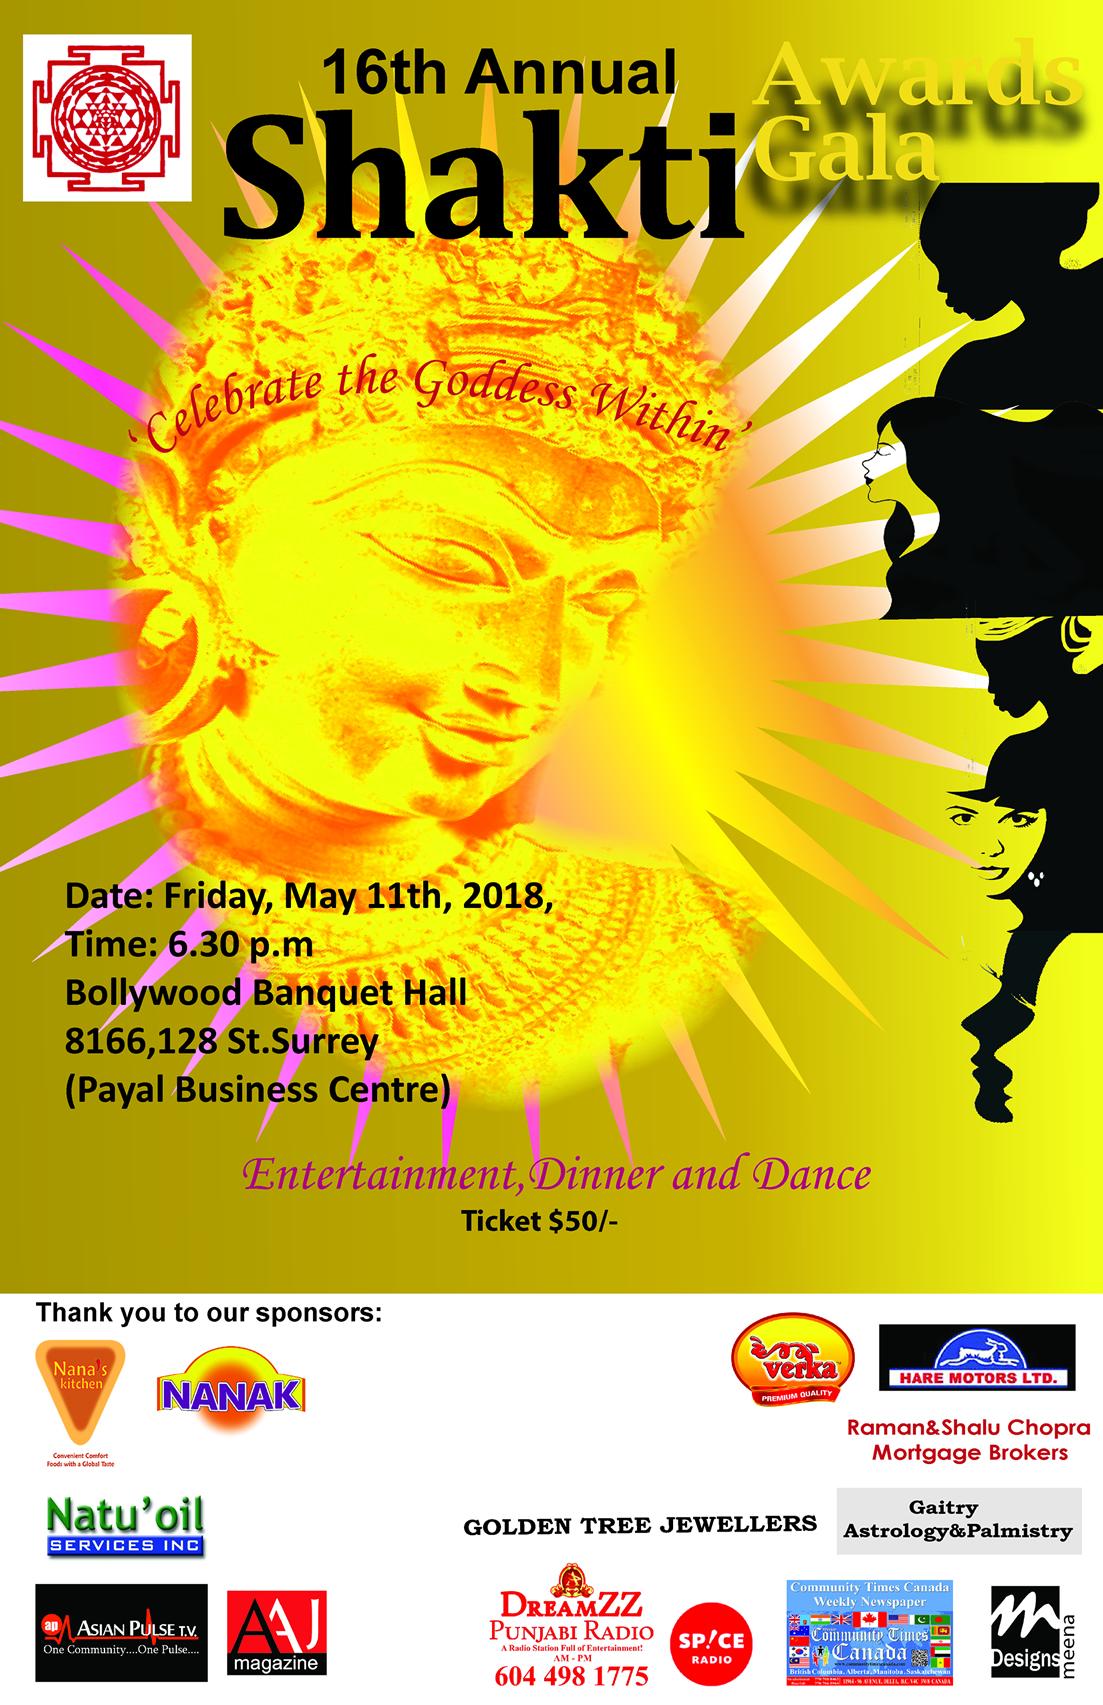 16th Annual Shakti Awards Gala